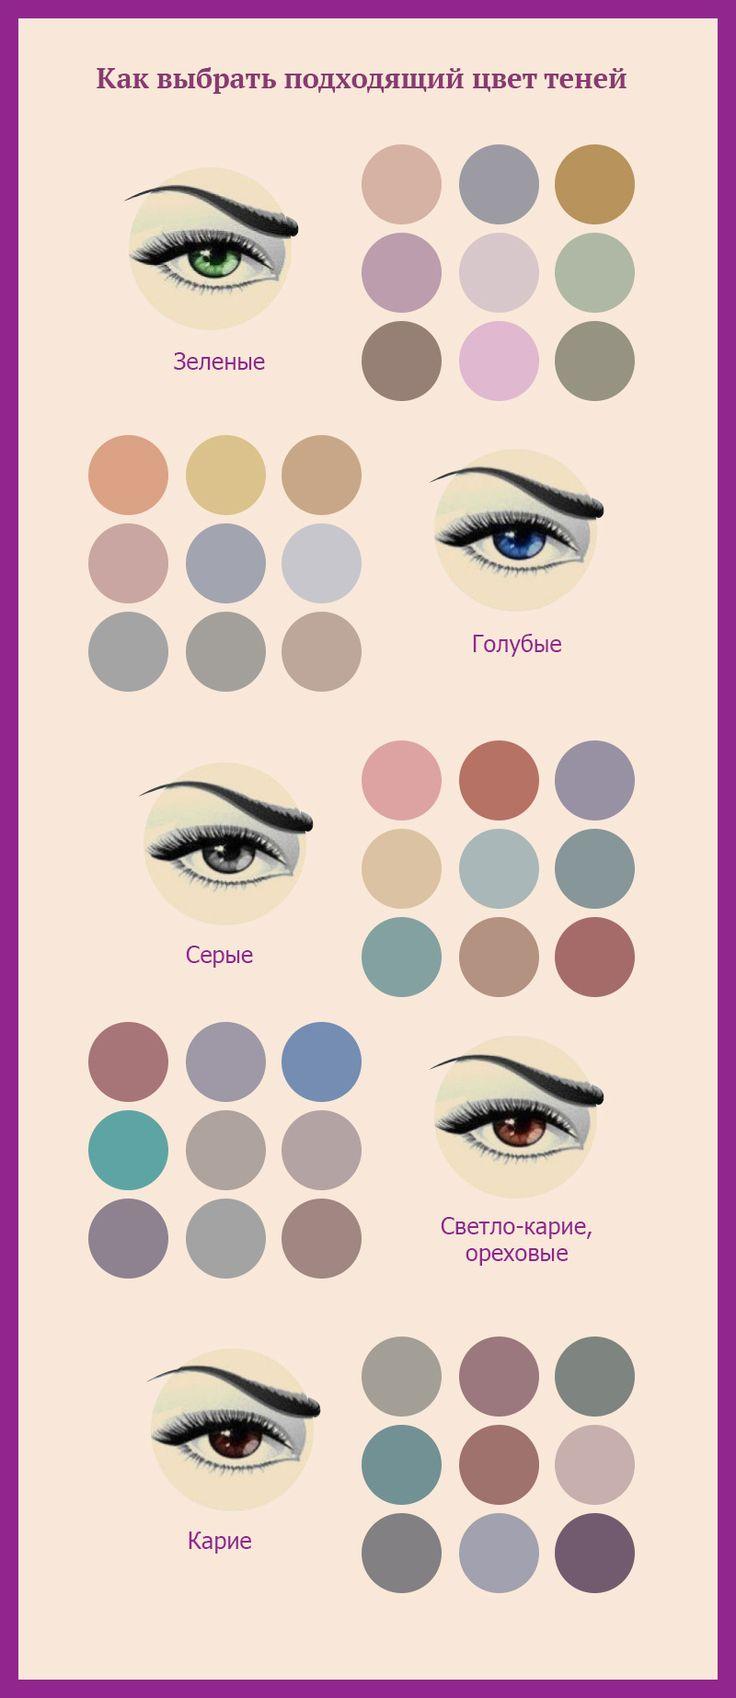 Кому какие цвета подходят в макияже